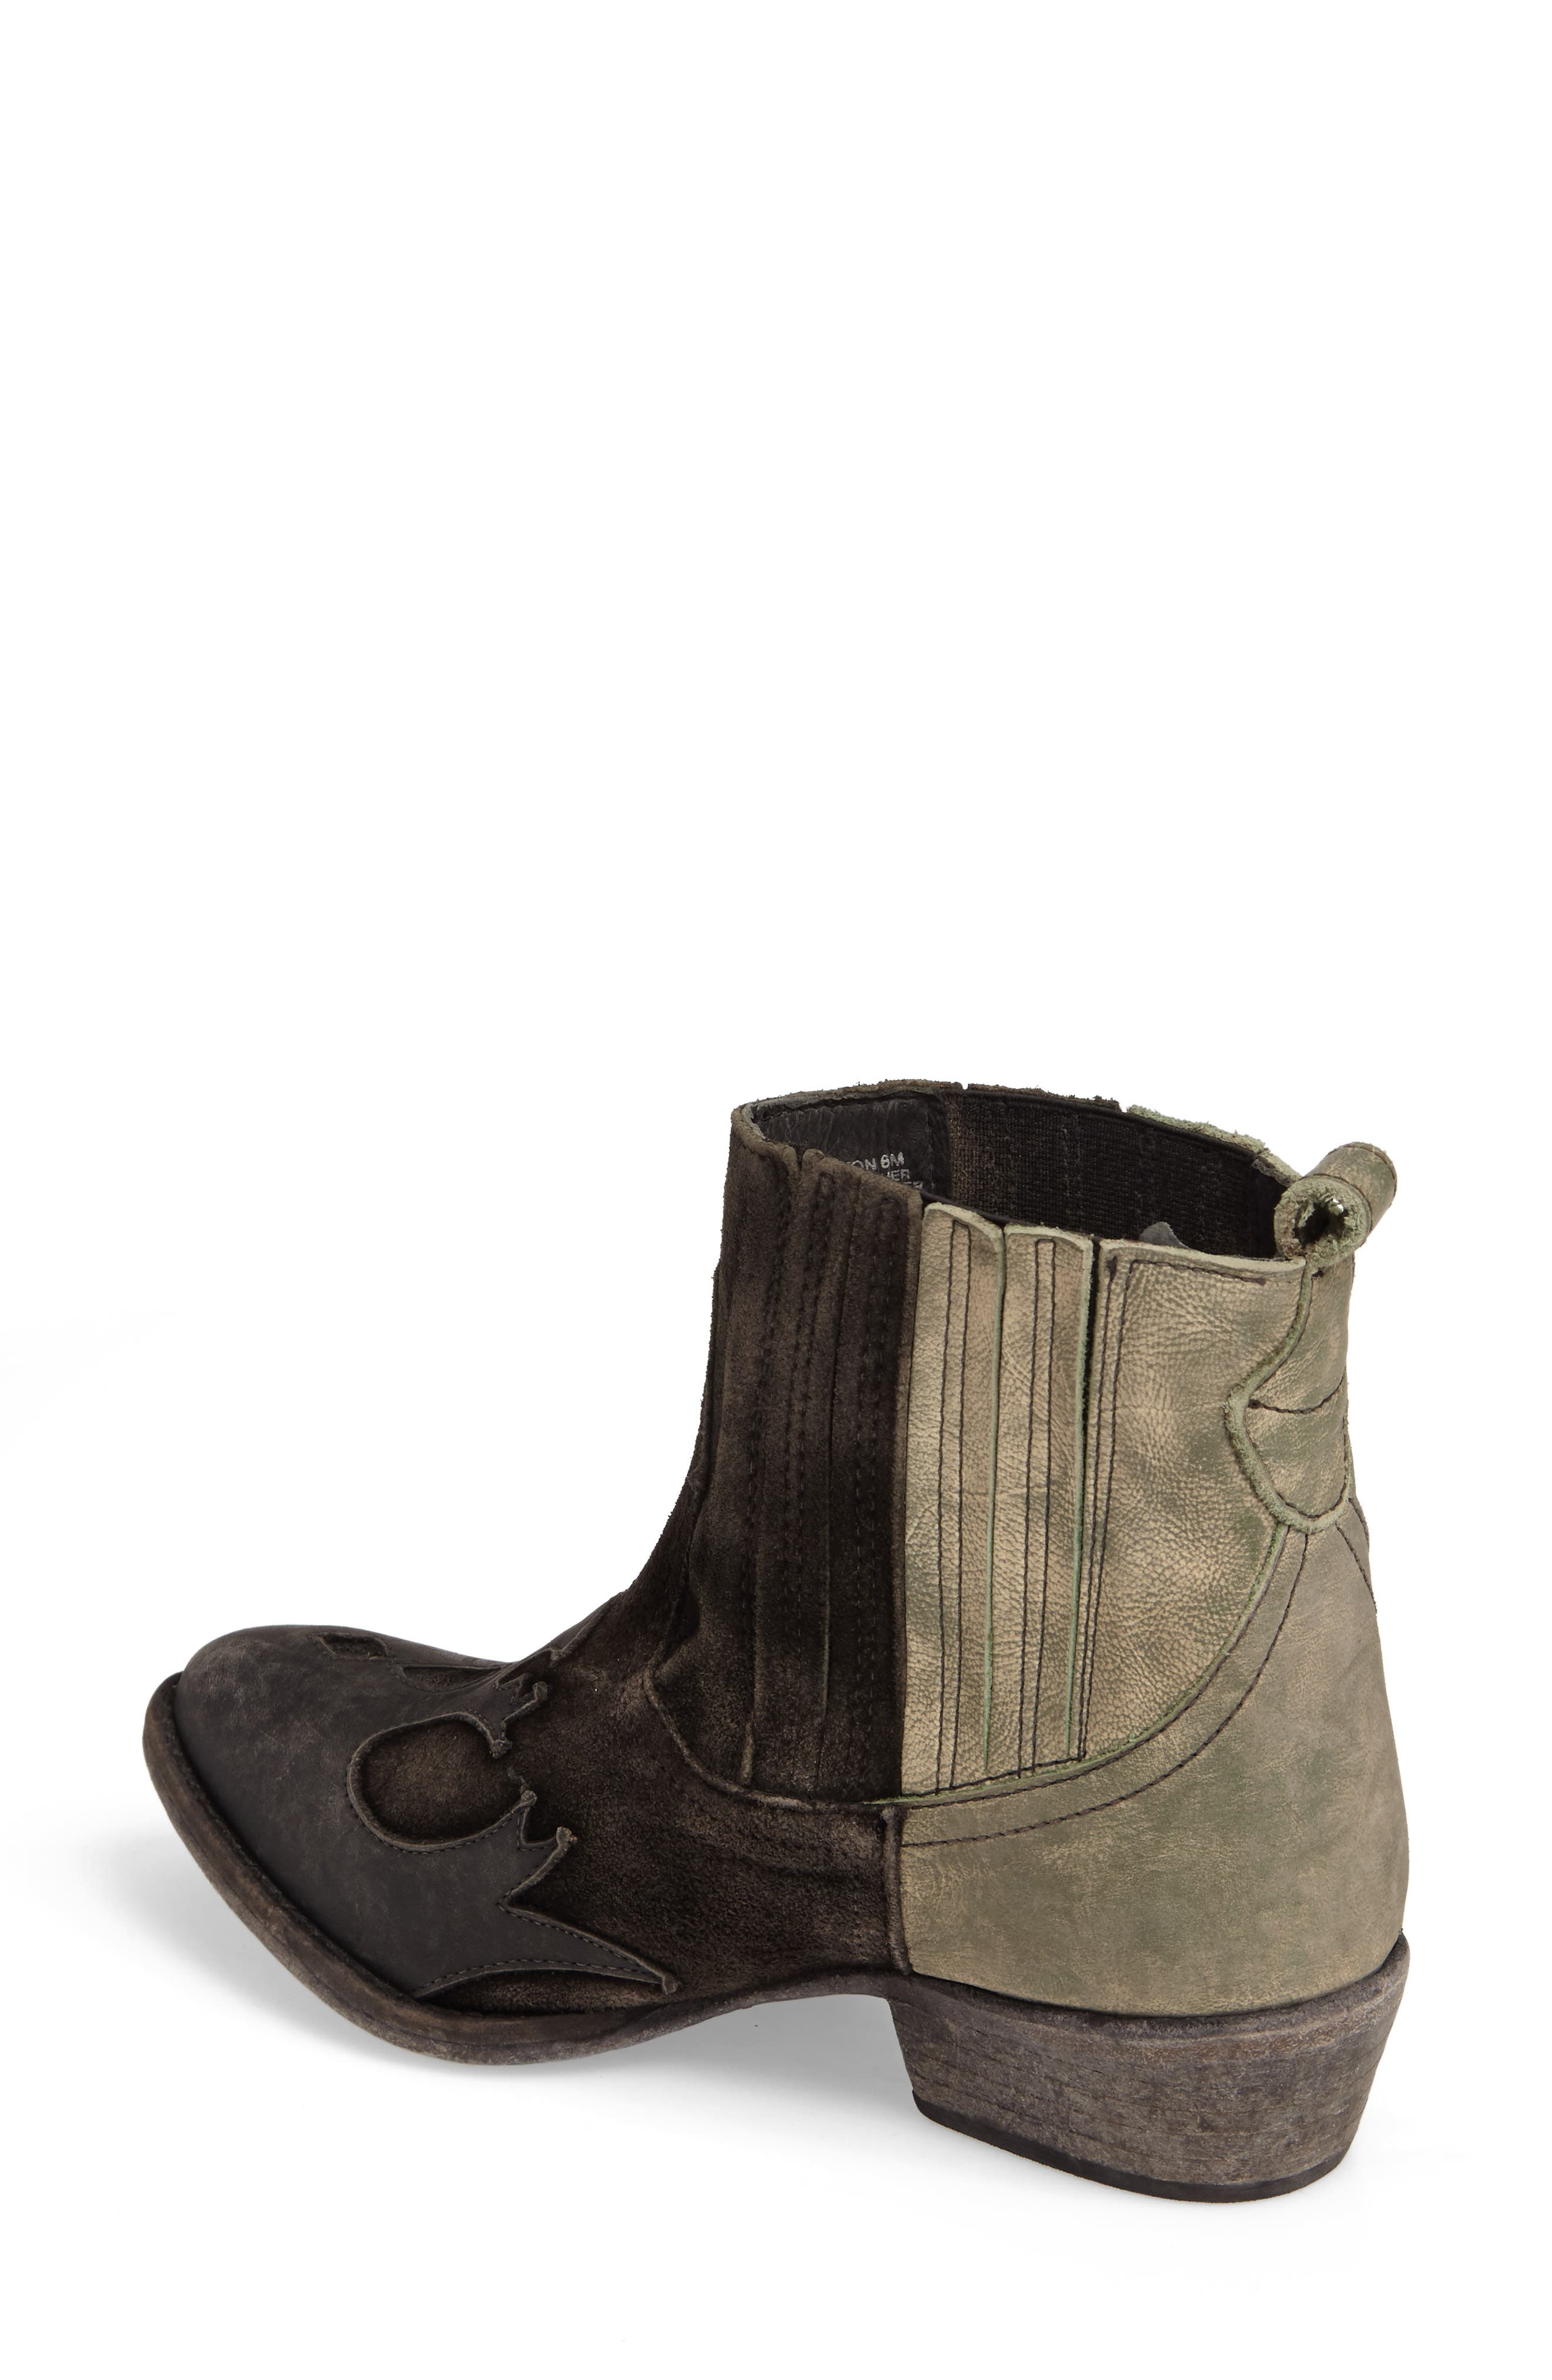 Royston Bootie,                             Alternate thumbnail 2, color,                             Black Leather